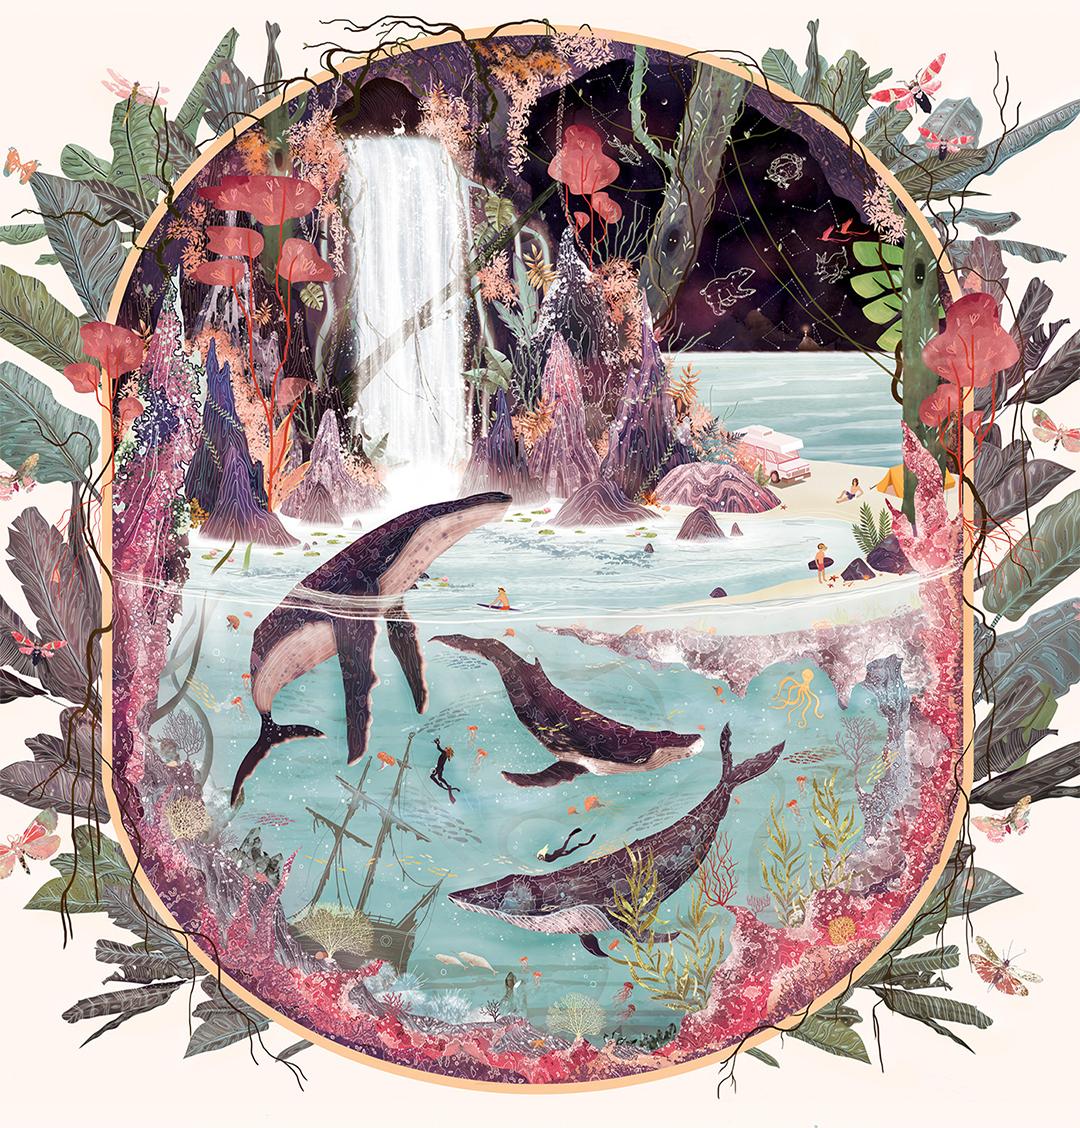 Svabhu Kohli's : Beautiful Splendor of Nature Comes to Life in Surreal Illustrations